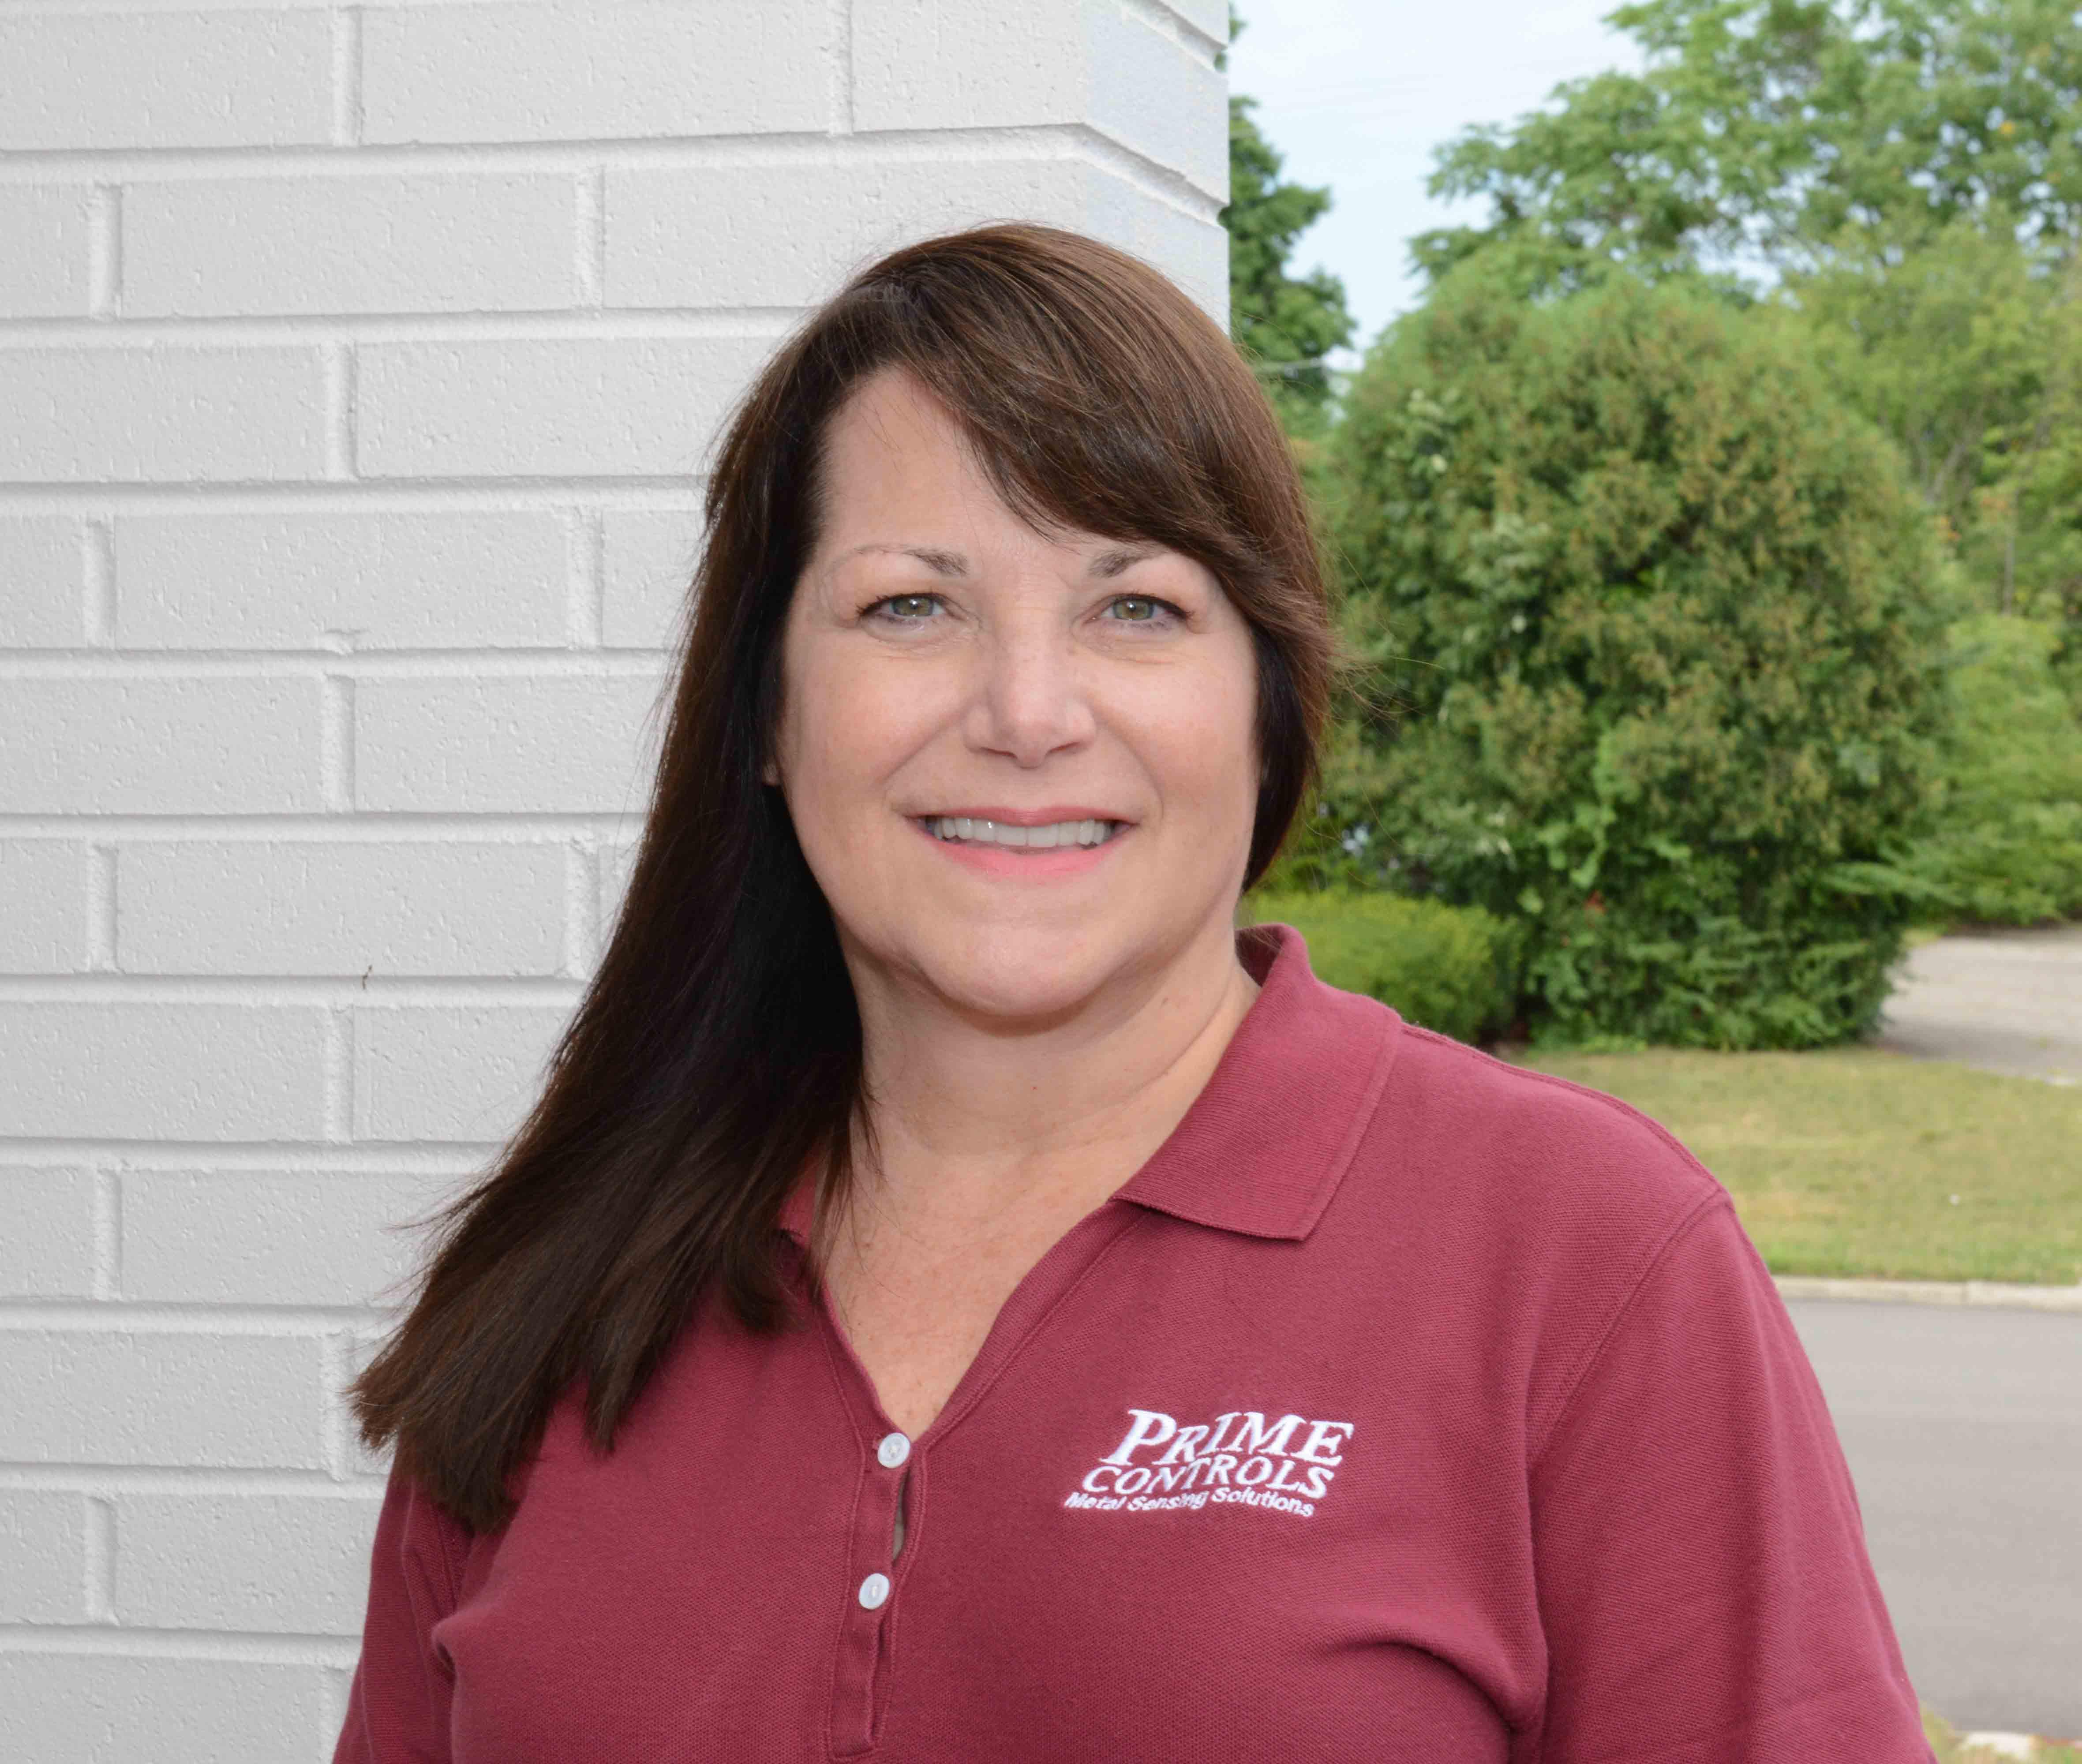 Prime Controls Staff Picture Jessica King